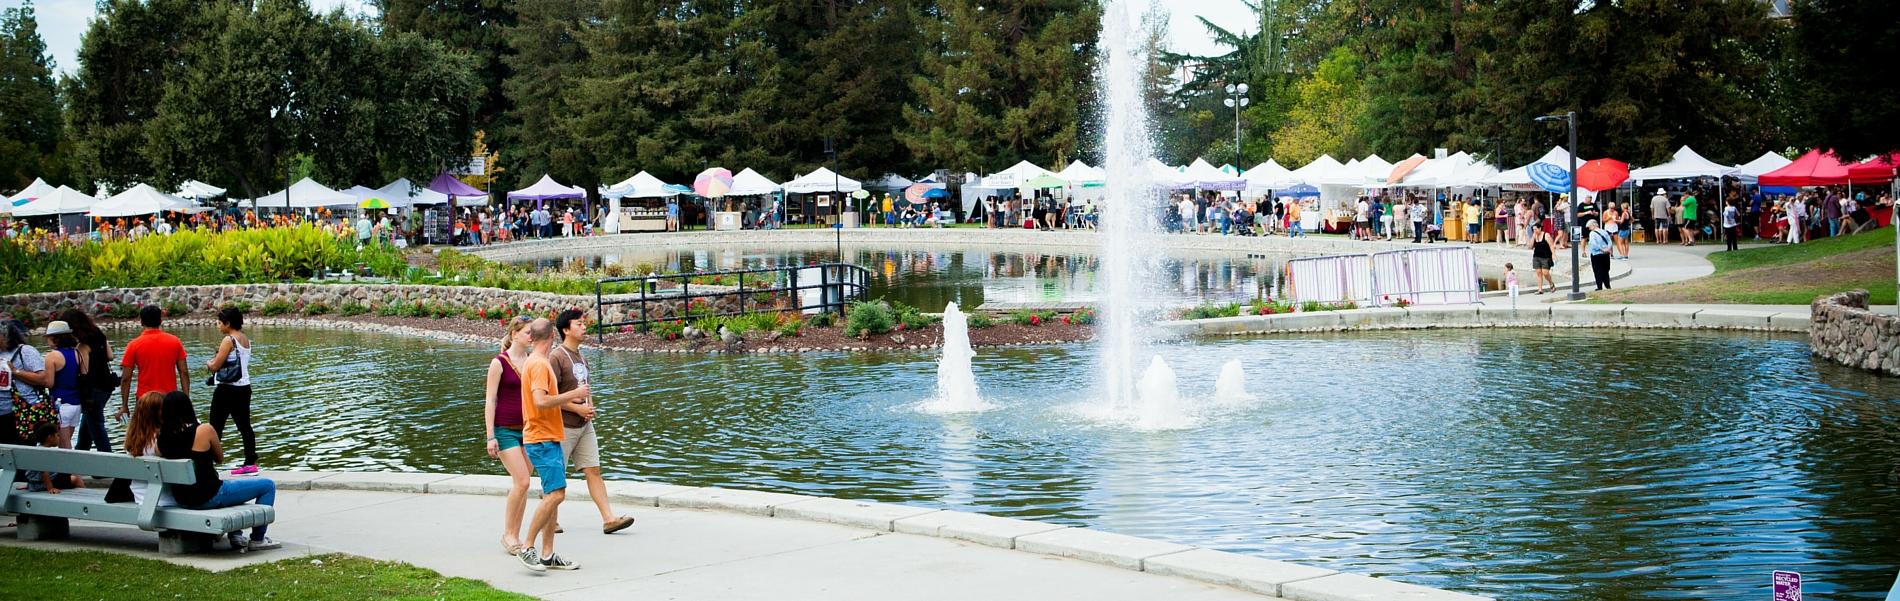 Santa Clara Calendar Events - Visit Santa Clara, California With Regard To San Jose Conventions Center Calendar